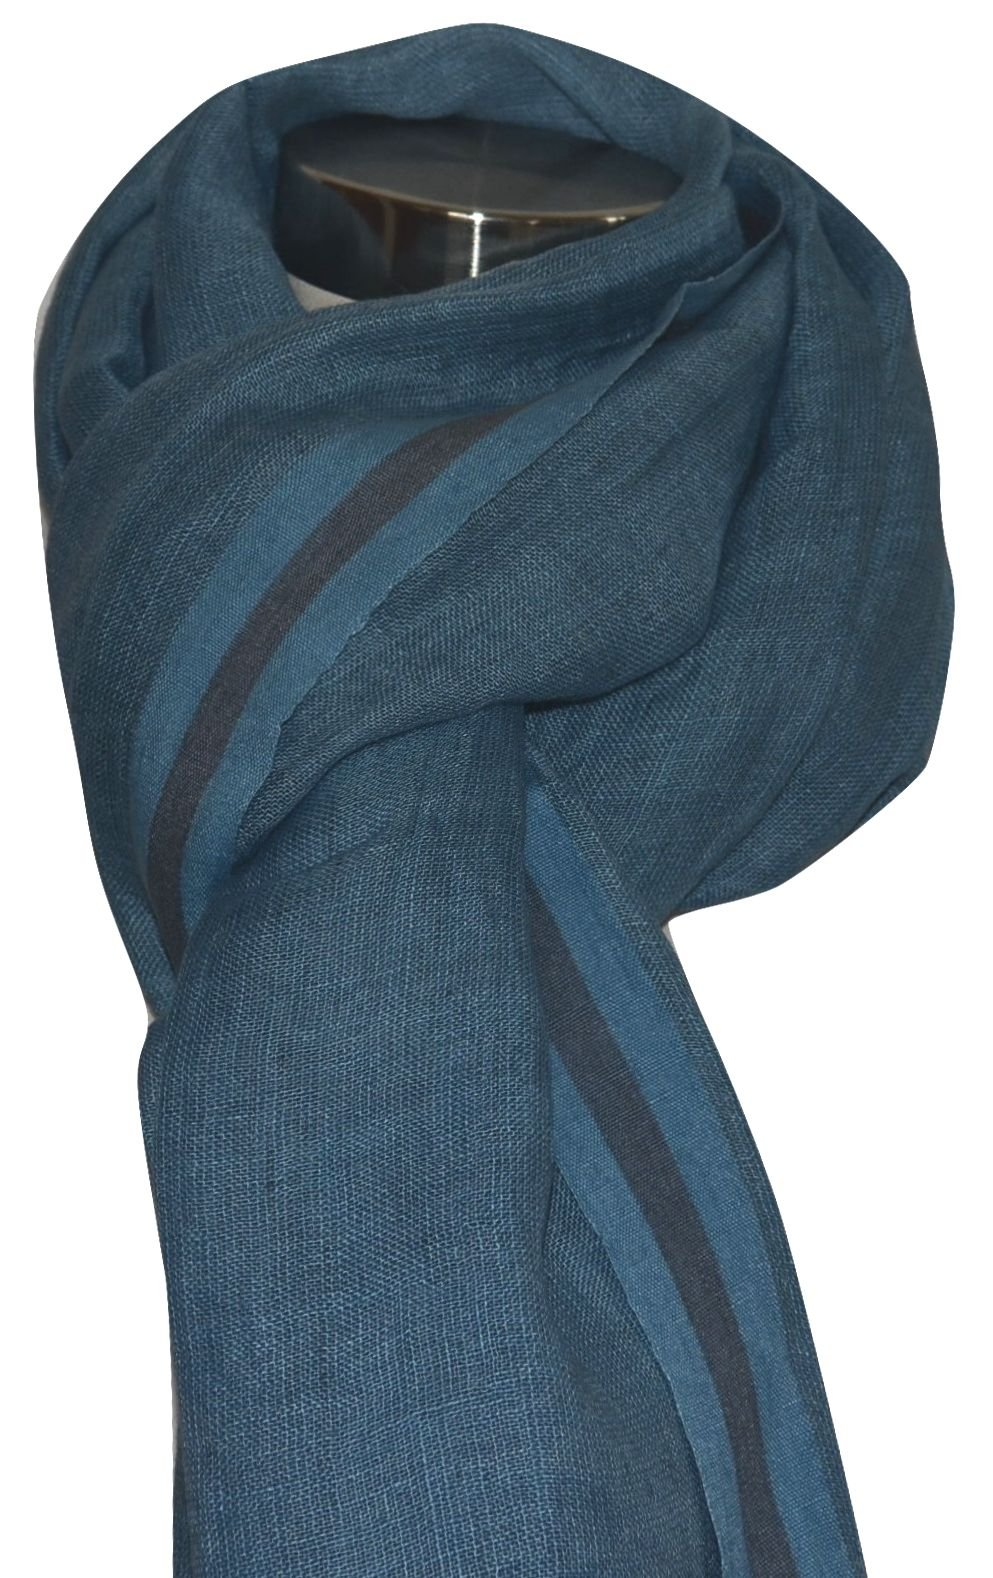 Hand Spun, Handwoven Shorty Weave Pure Linen Fabric Triple Stripe edge Scarf. X1425